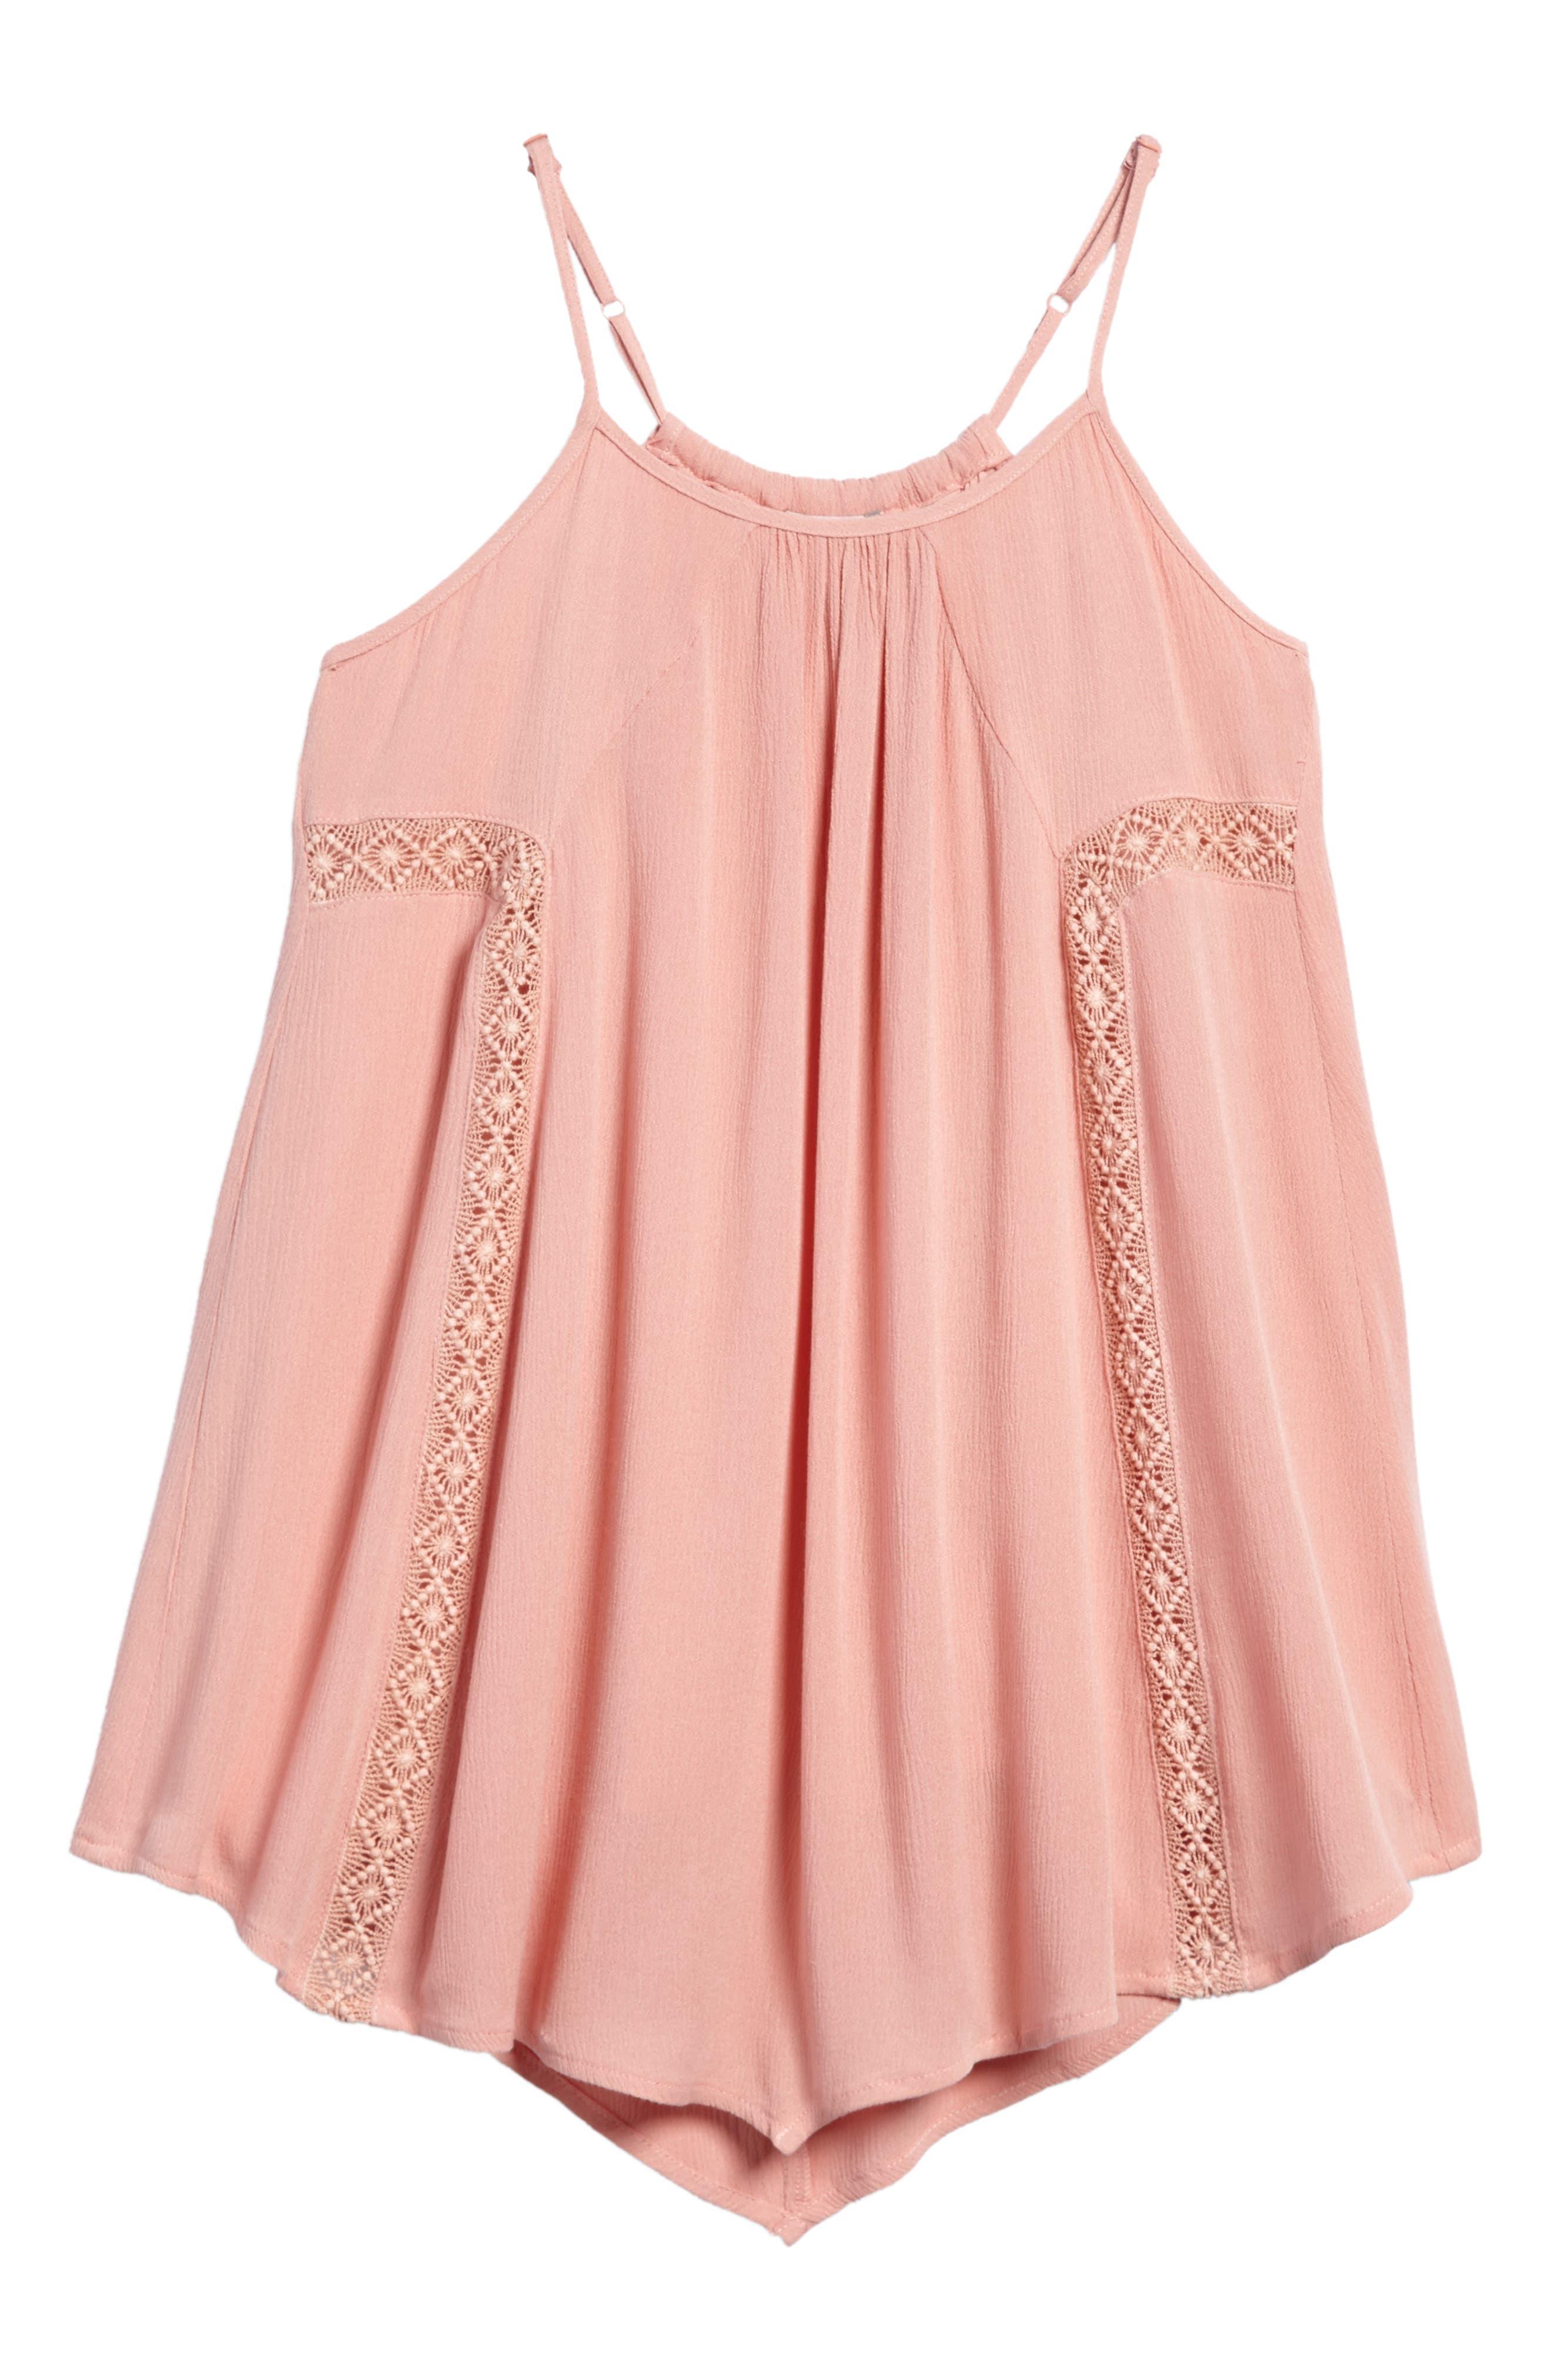 Main Image - For All Seasons Lace Trim Trapeze Dress (Big Girls)